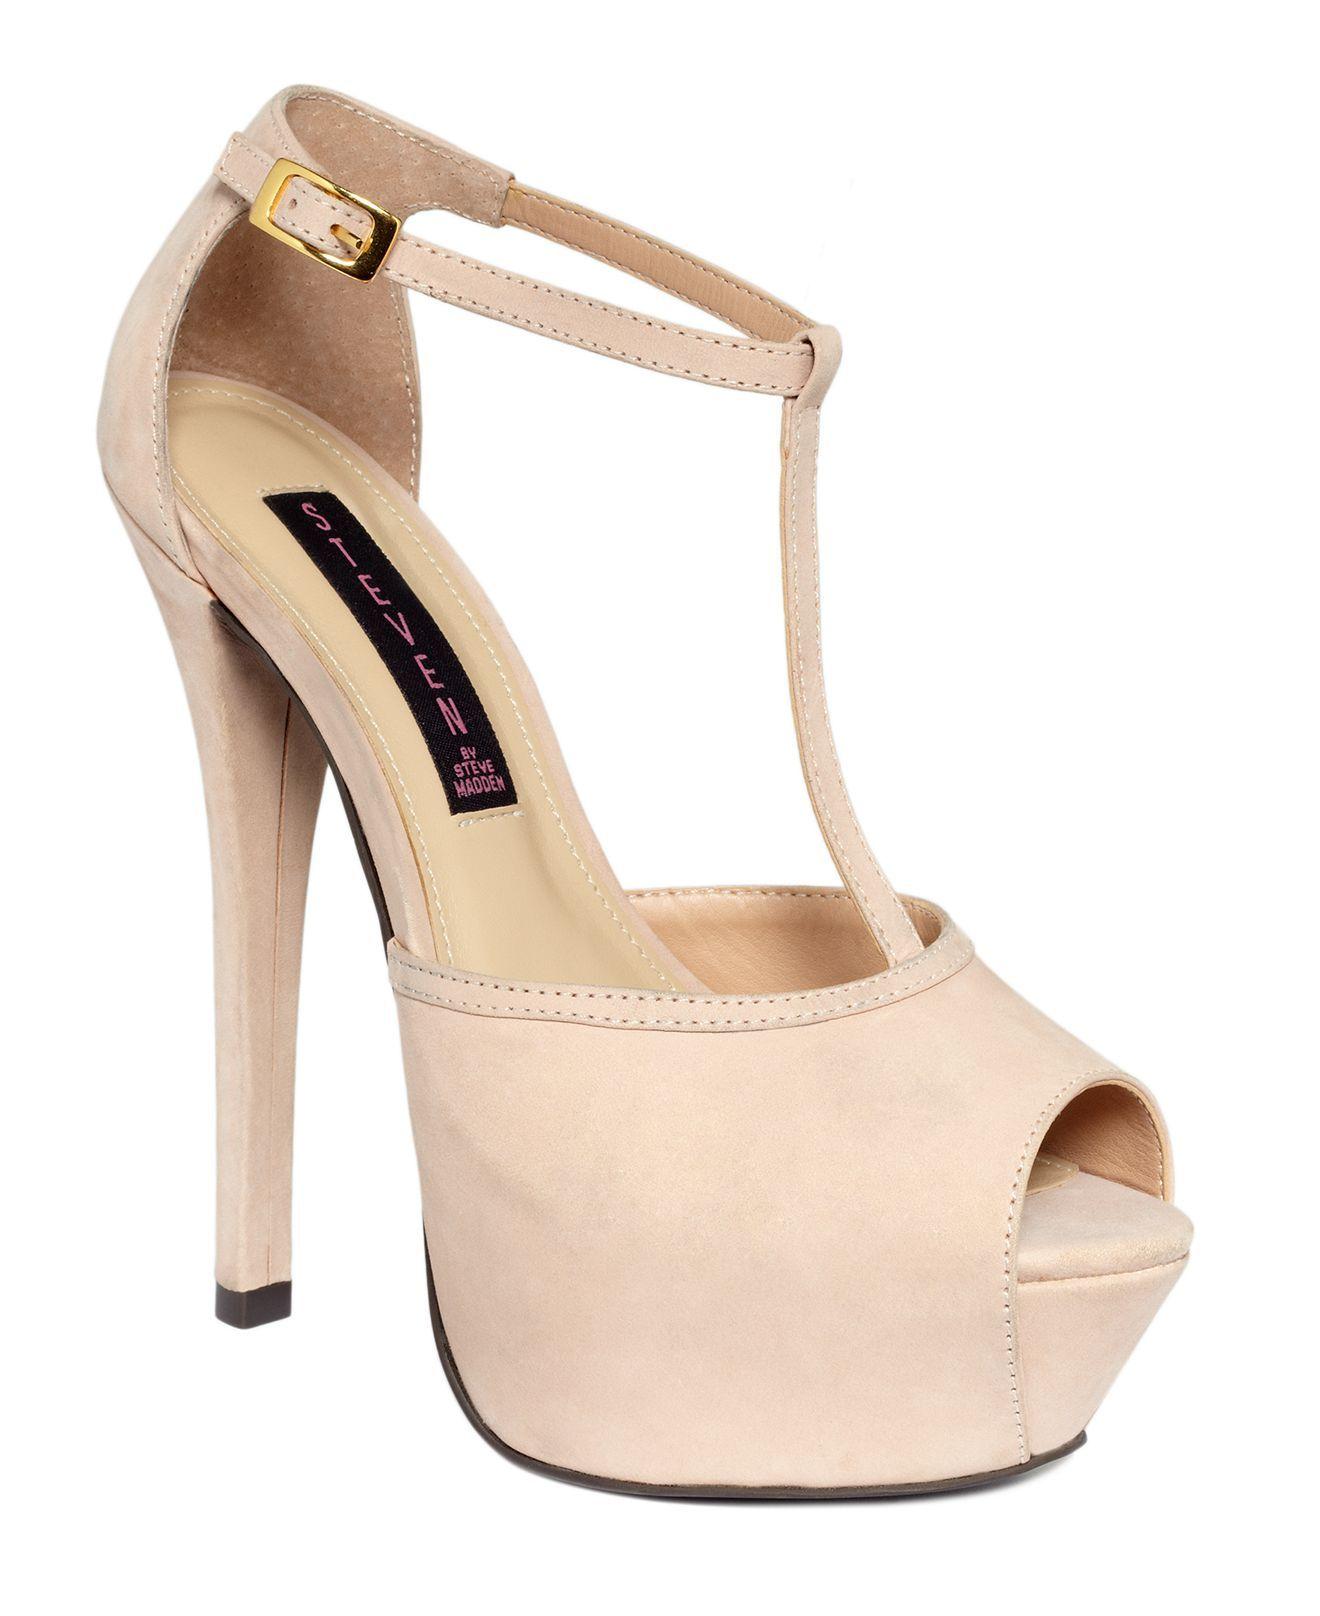 STEVEN by steve madden shoes. angels T strap platform pumps. $159 -worth it